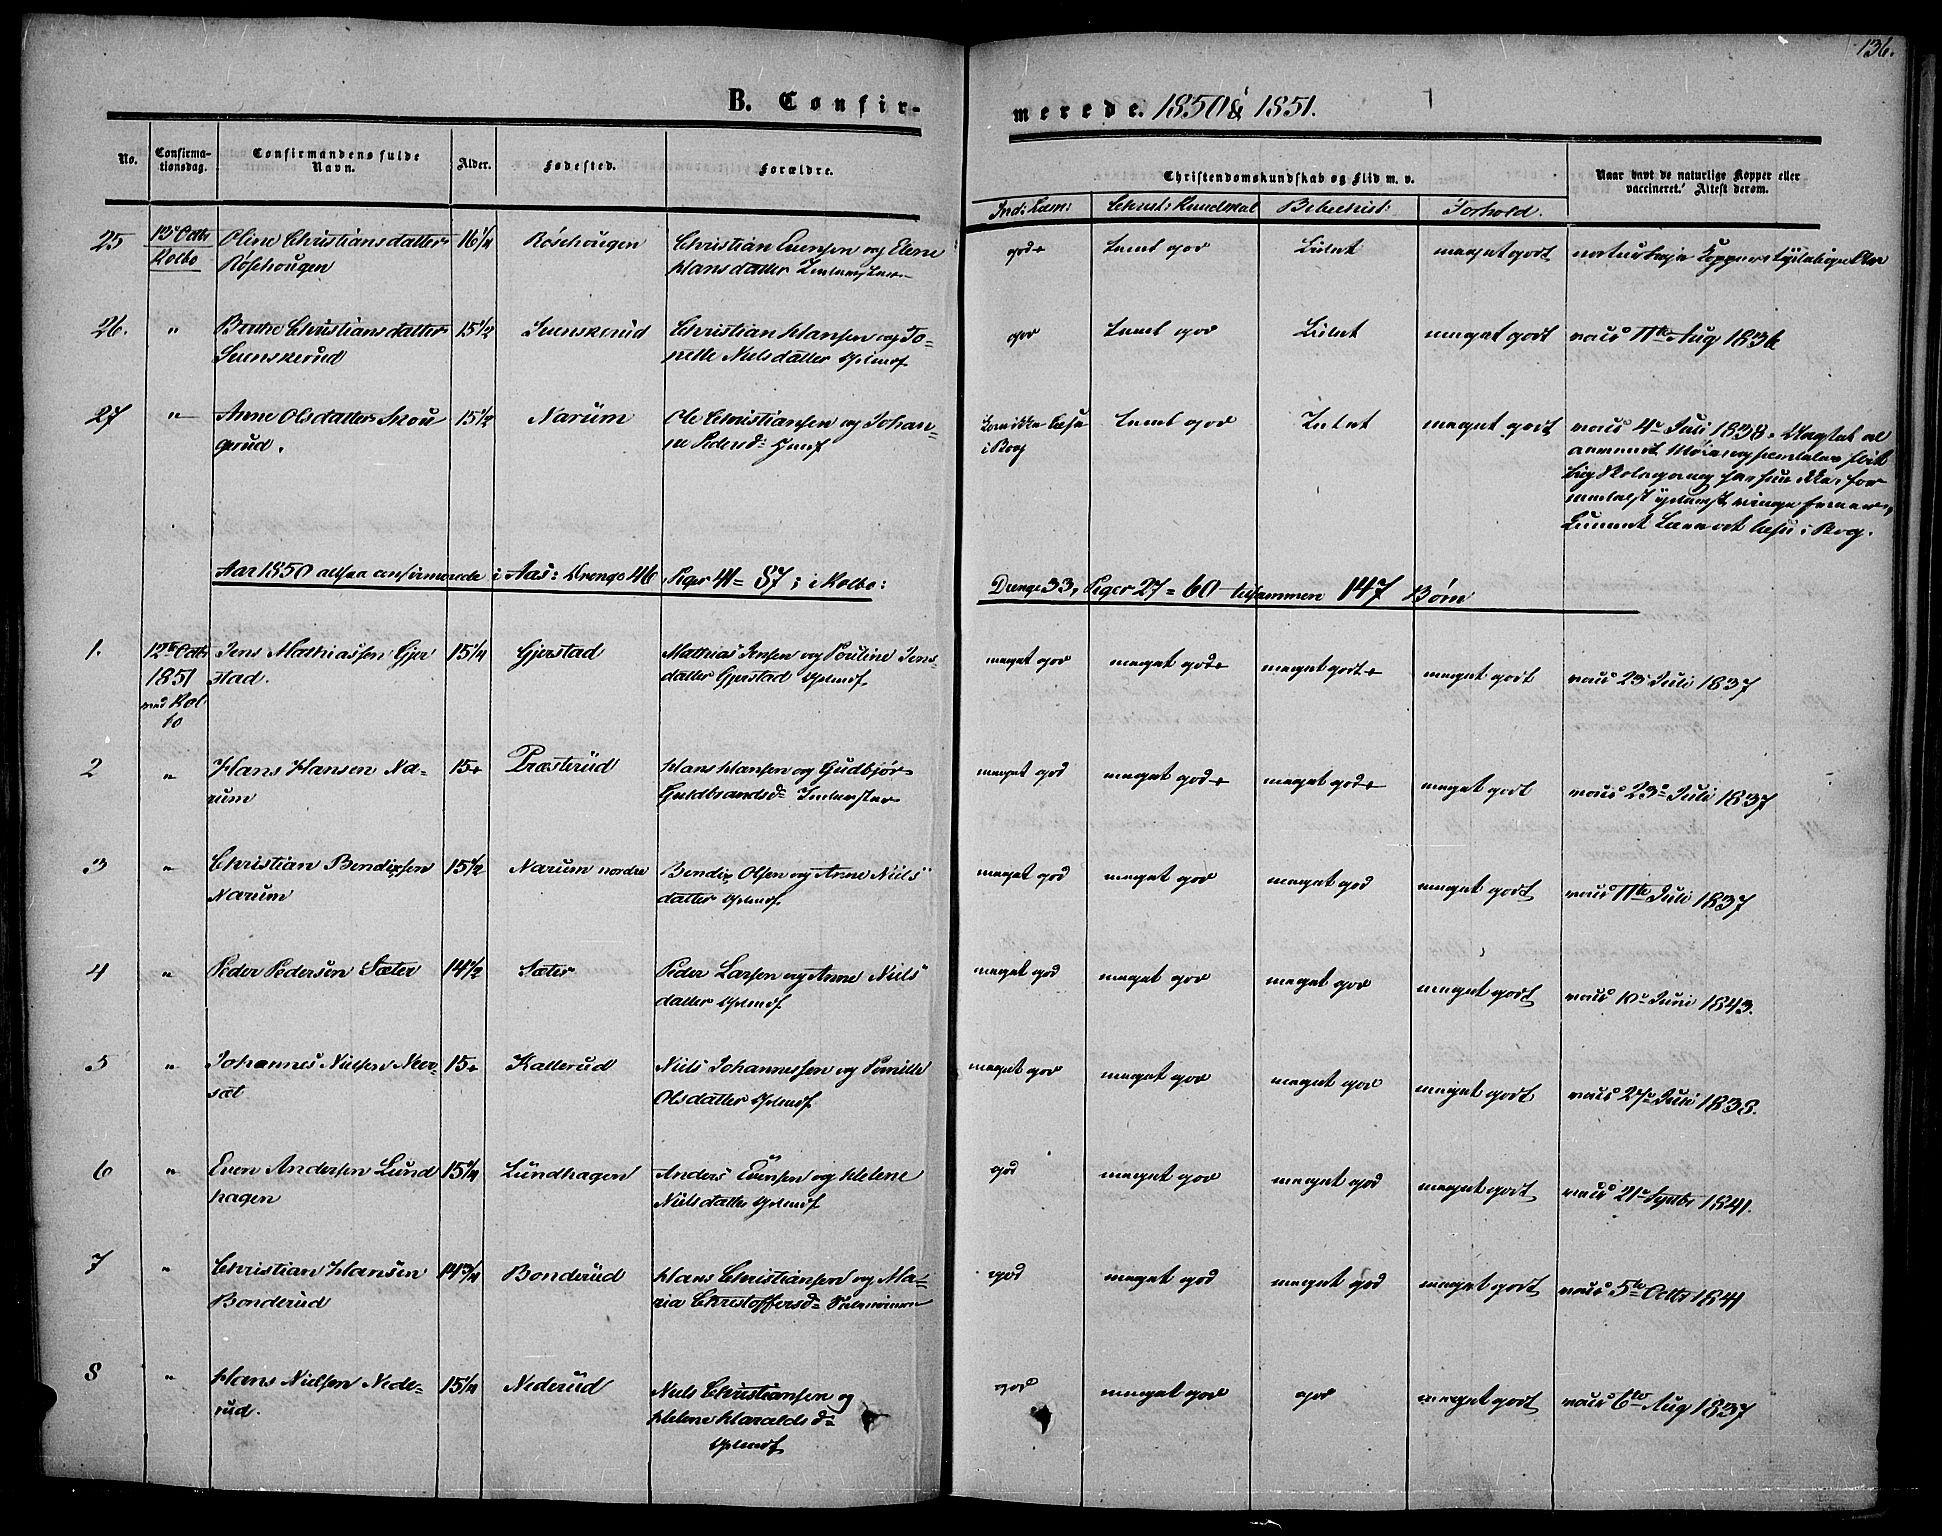 SAH, Vestre Toten prestekontor, H/Ha/Haa/L0005: Ministerialbok nr. 5, 1850-1855, s. 136